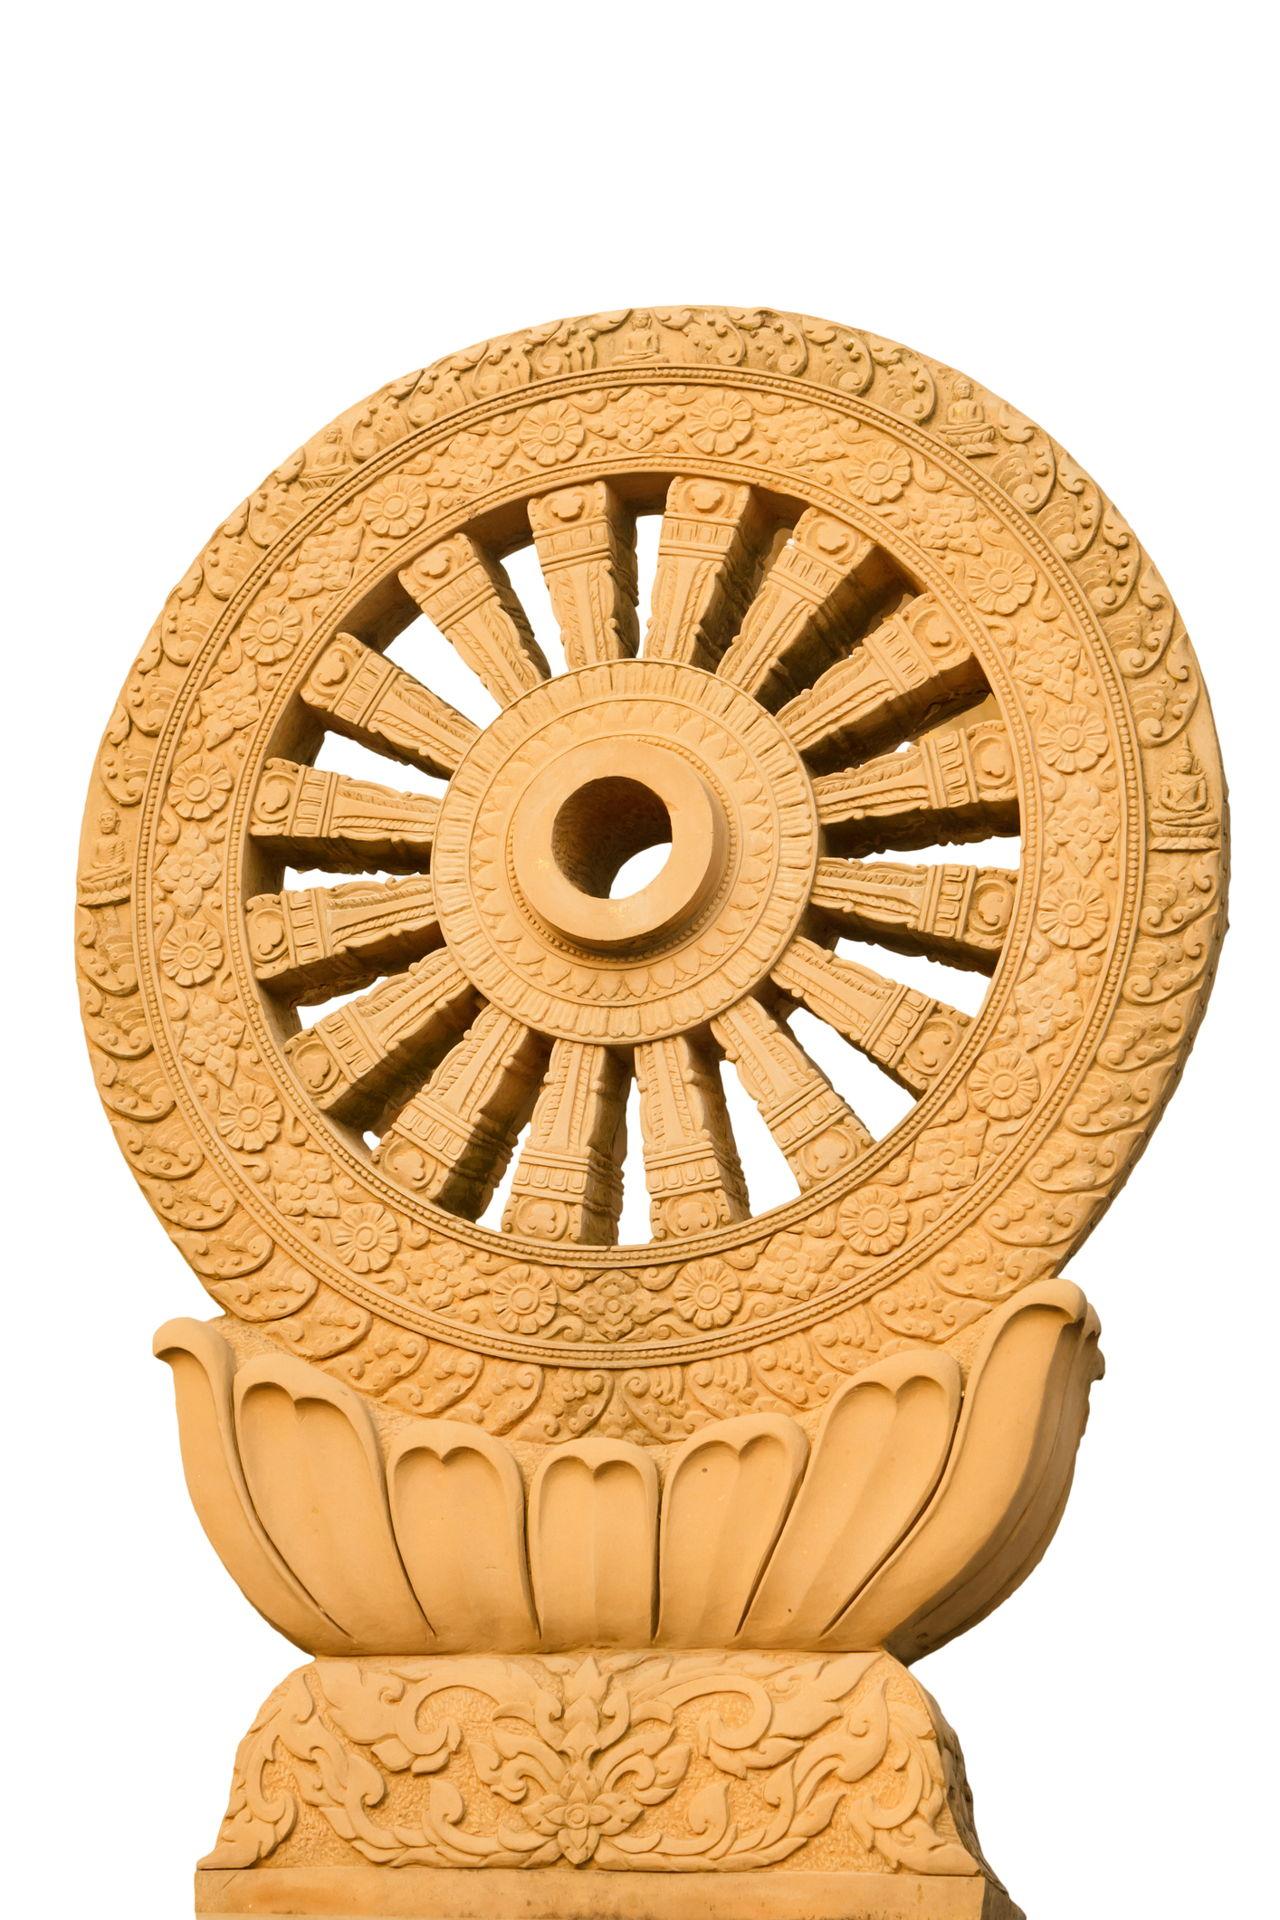 Learn Here What A Dharma Wheel Dharmachakra Means